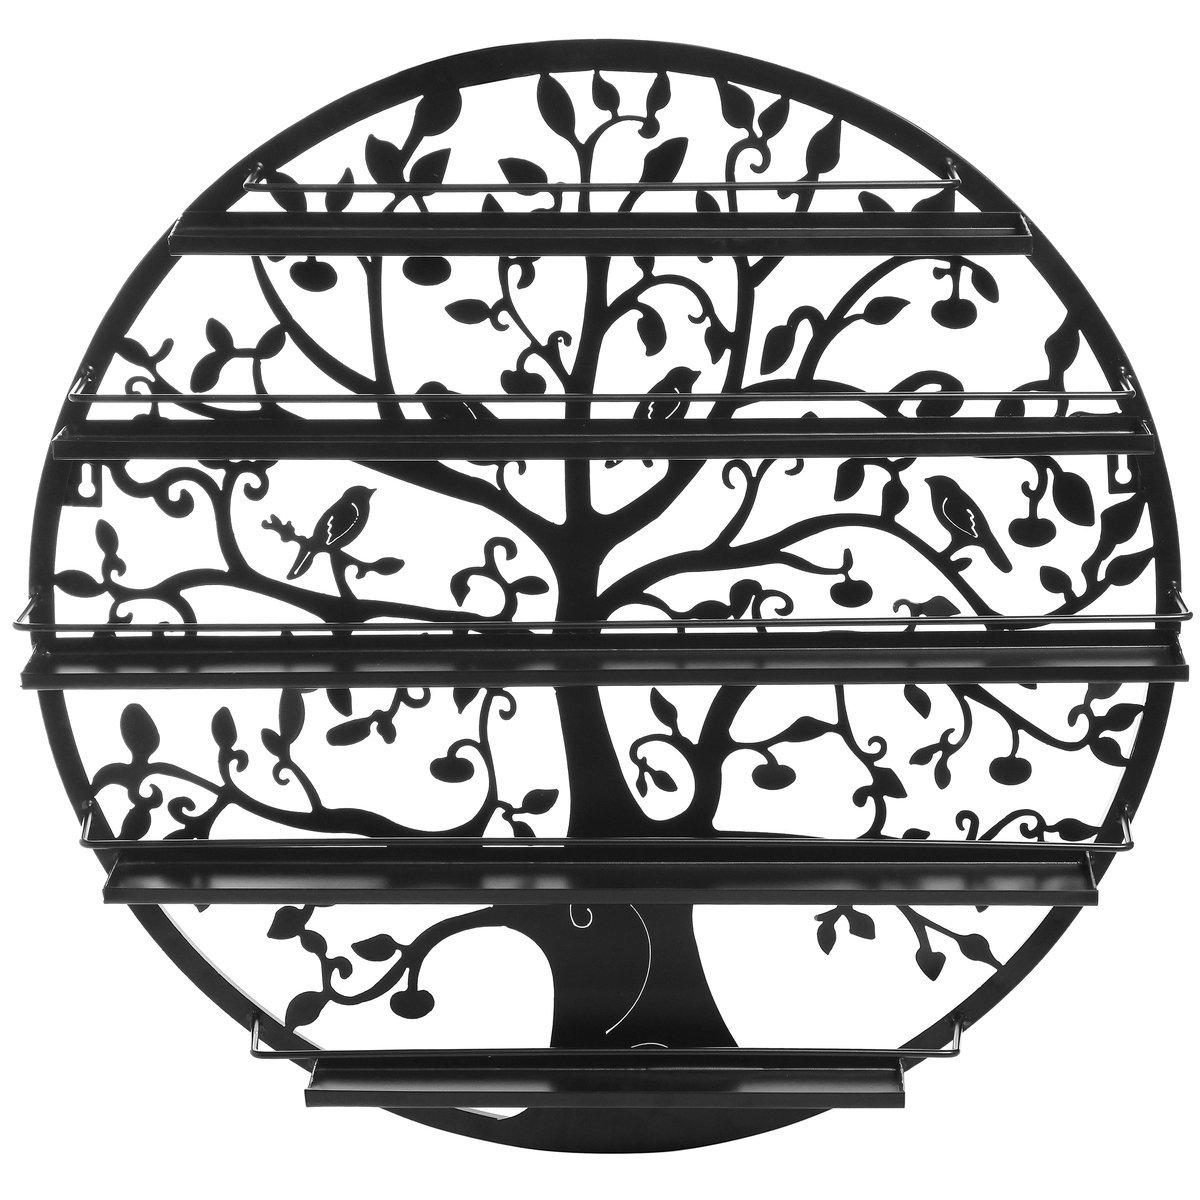 Tree Silhouette Black Round Metal Wall Mounted 5 Tier Salon Nail Polish Rack Holder / Wall Art Display MyGift COMINHKPR60206